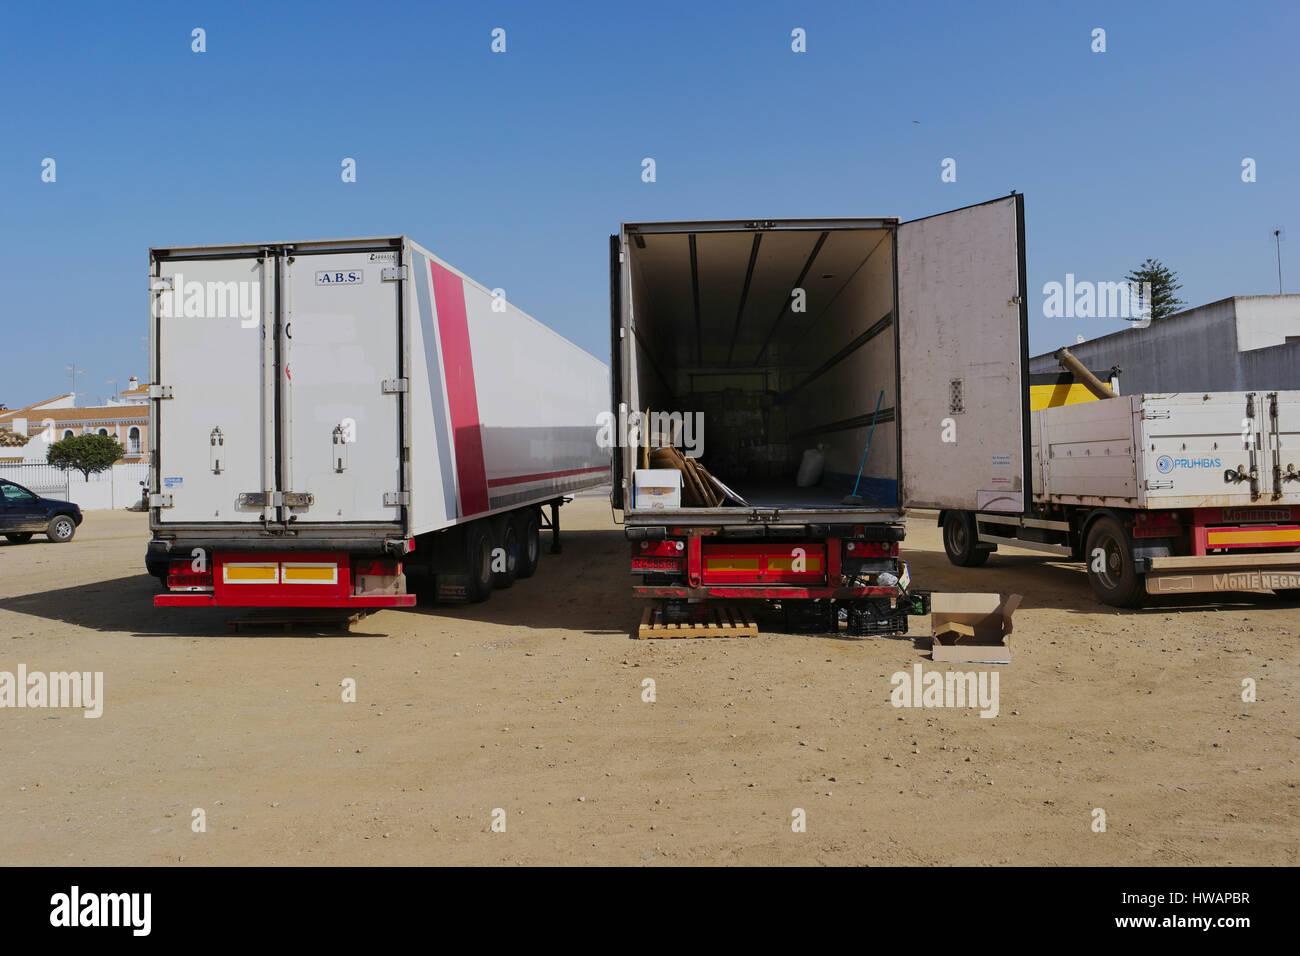 Trucks waiting load - Stock Image